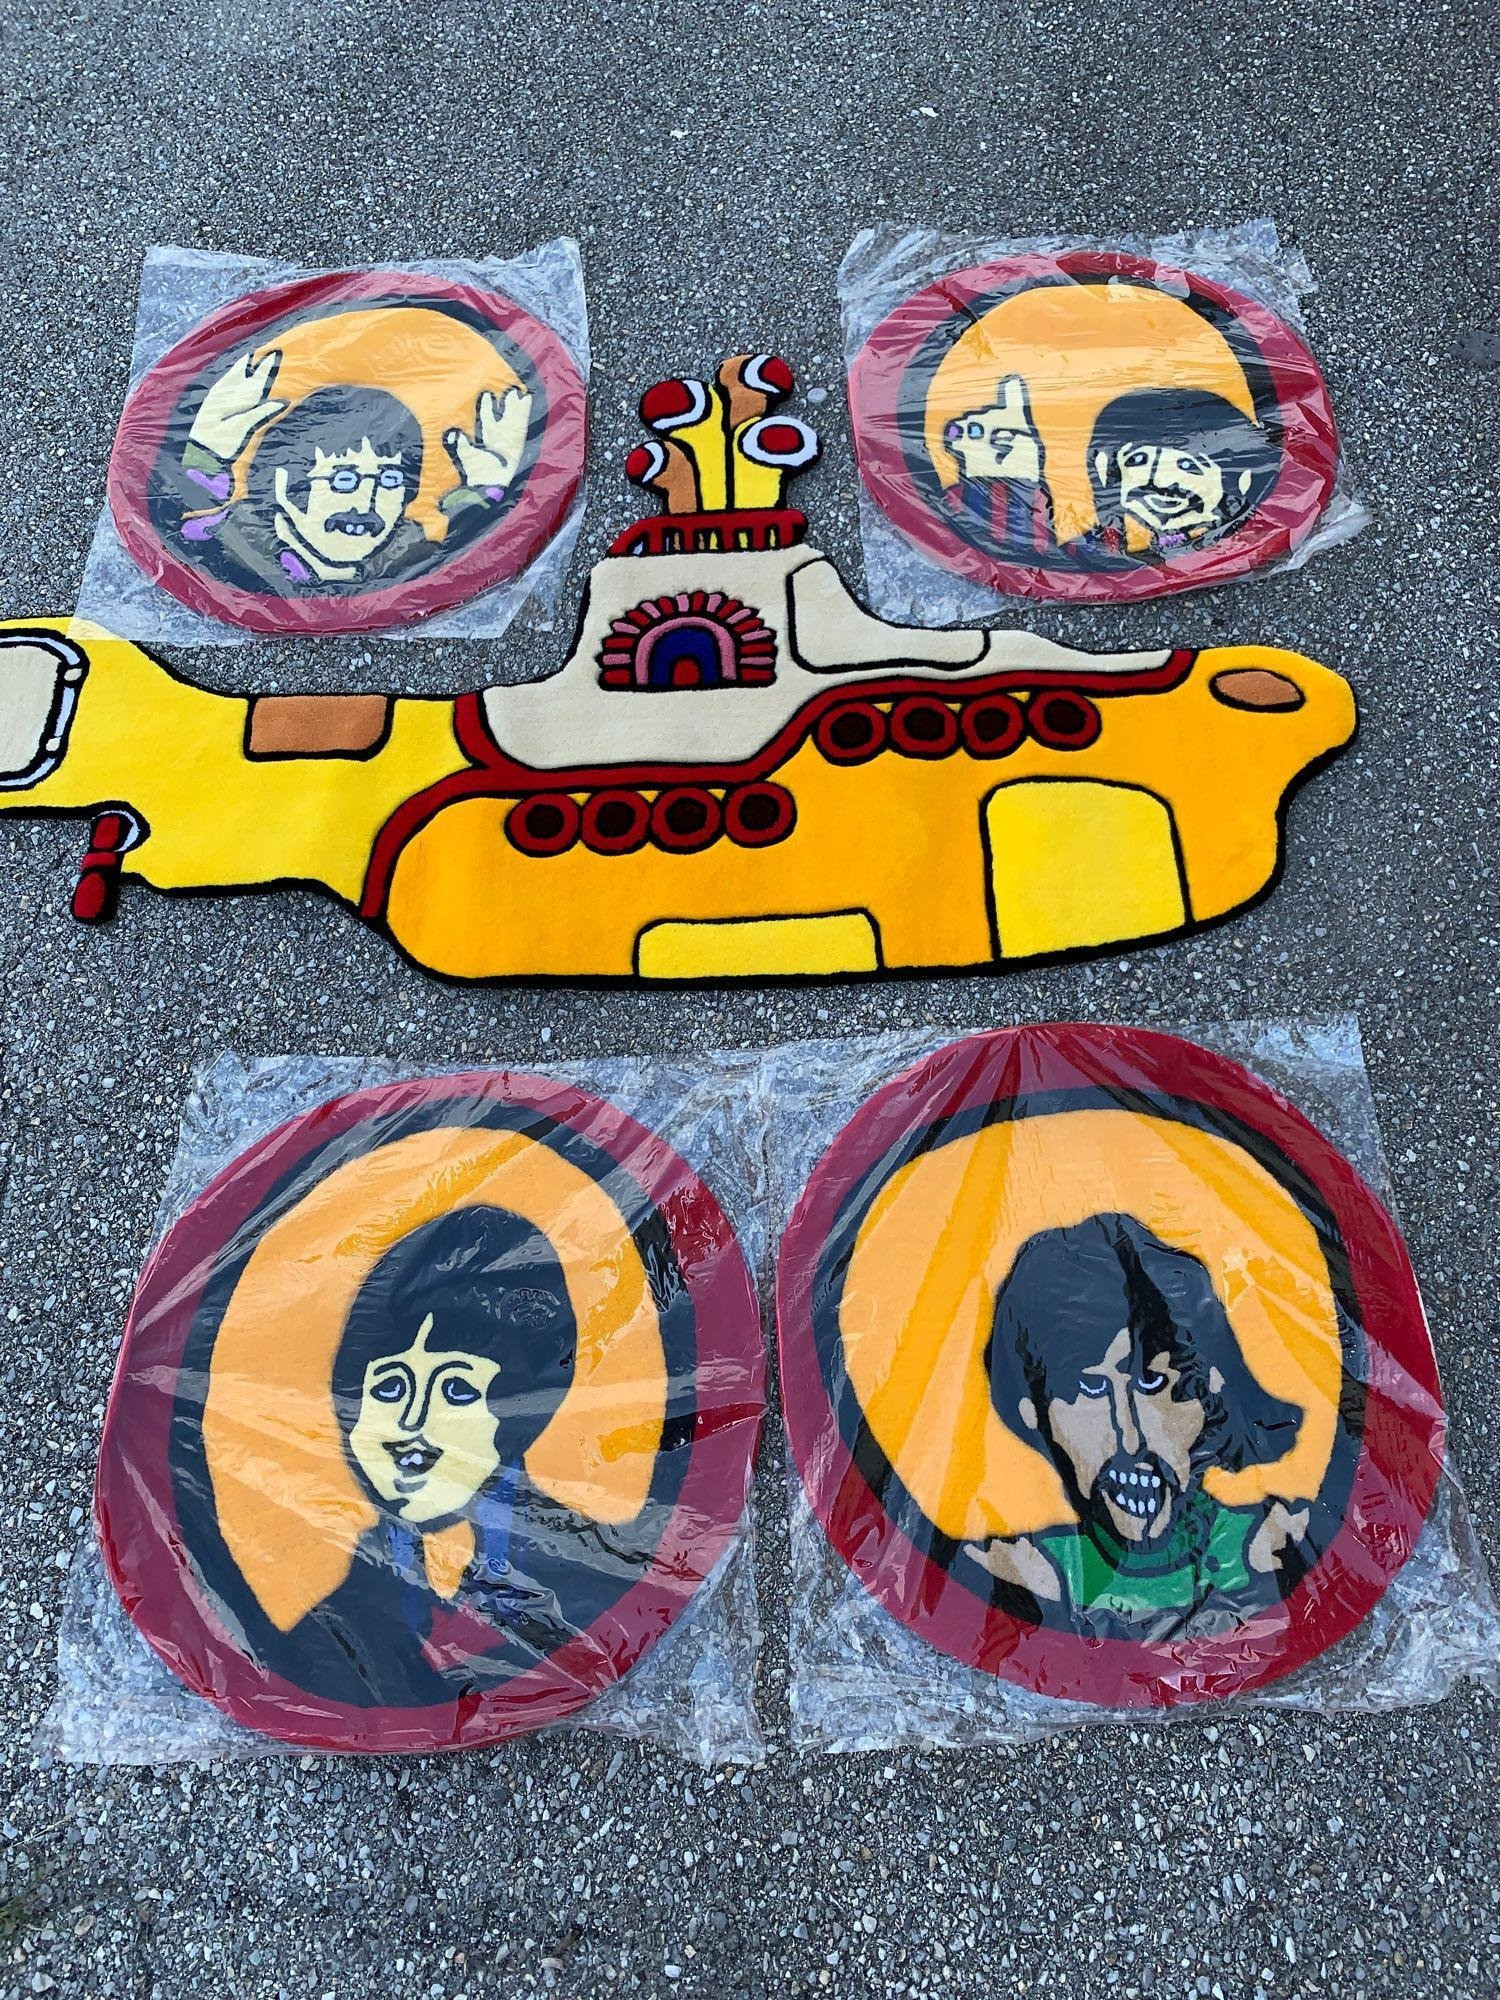 Five Small Beatles Yellow Submarine Carpets